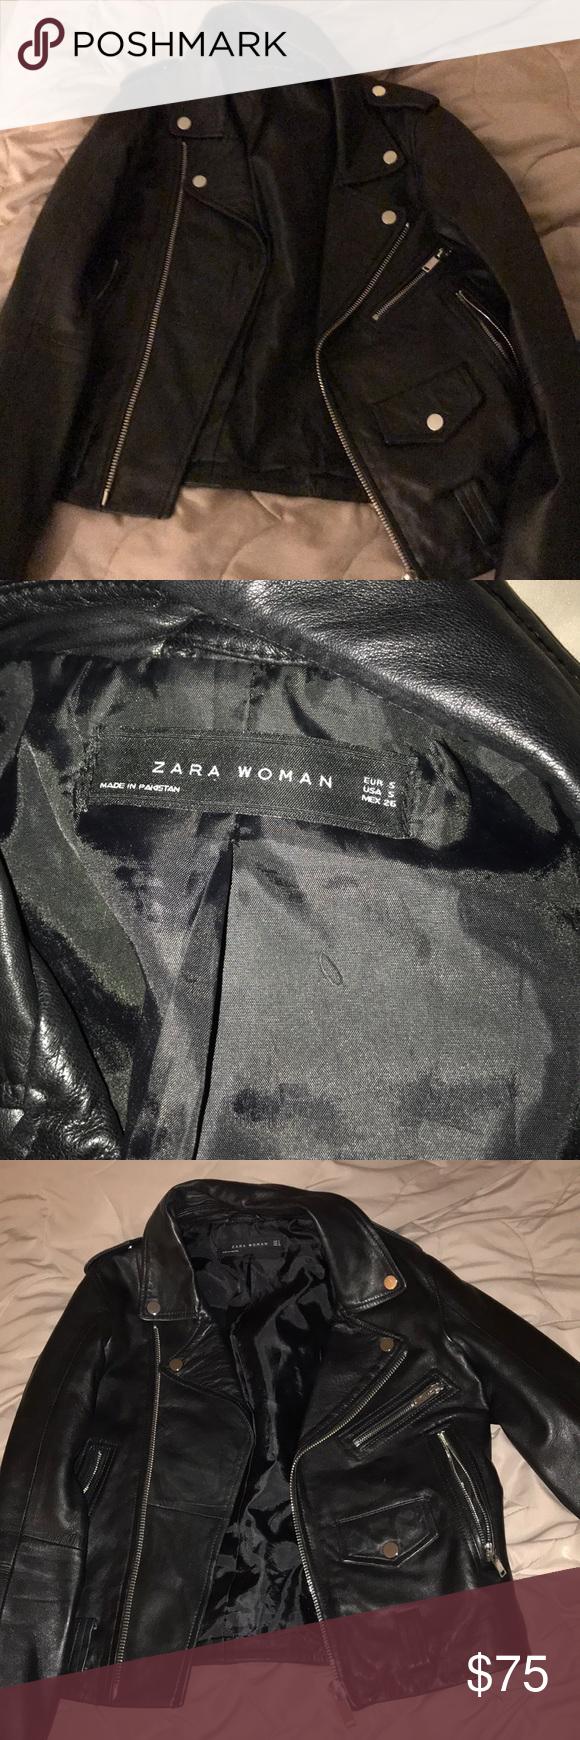 Zara sheepskin leather jacket Leather jacket, Jackets, Zara